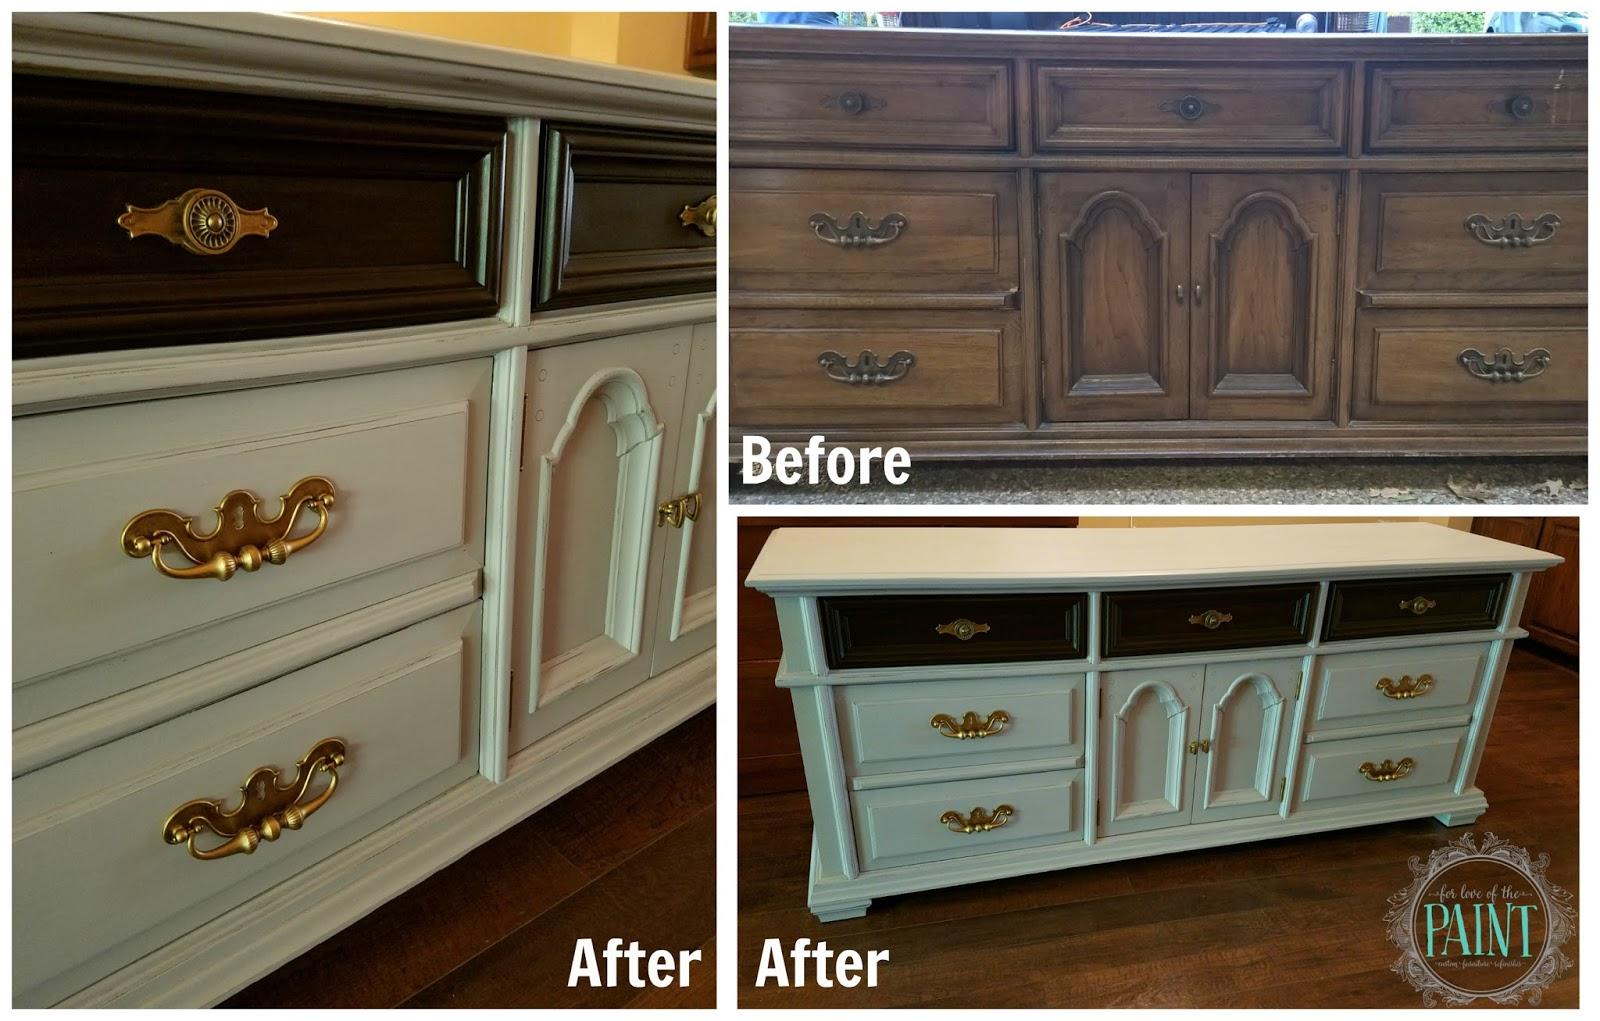 thin awesome drawers modern design dresser varnished wooden lowboy feet short handle strong dovetail storage large square brown nine case